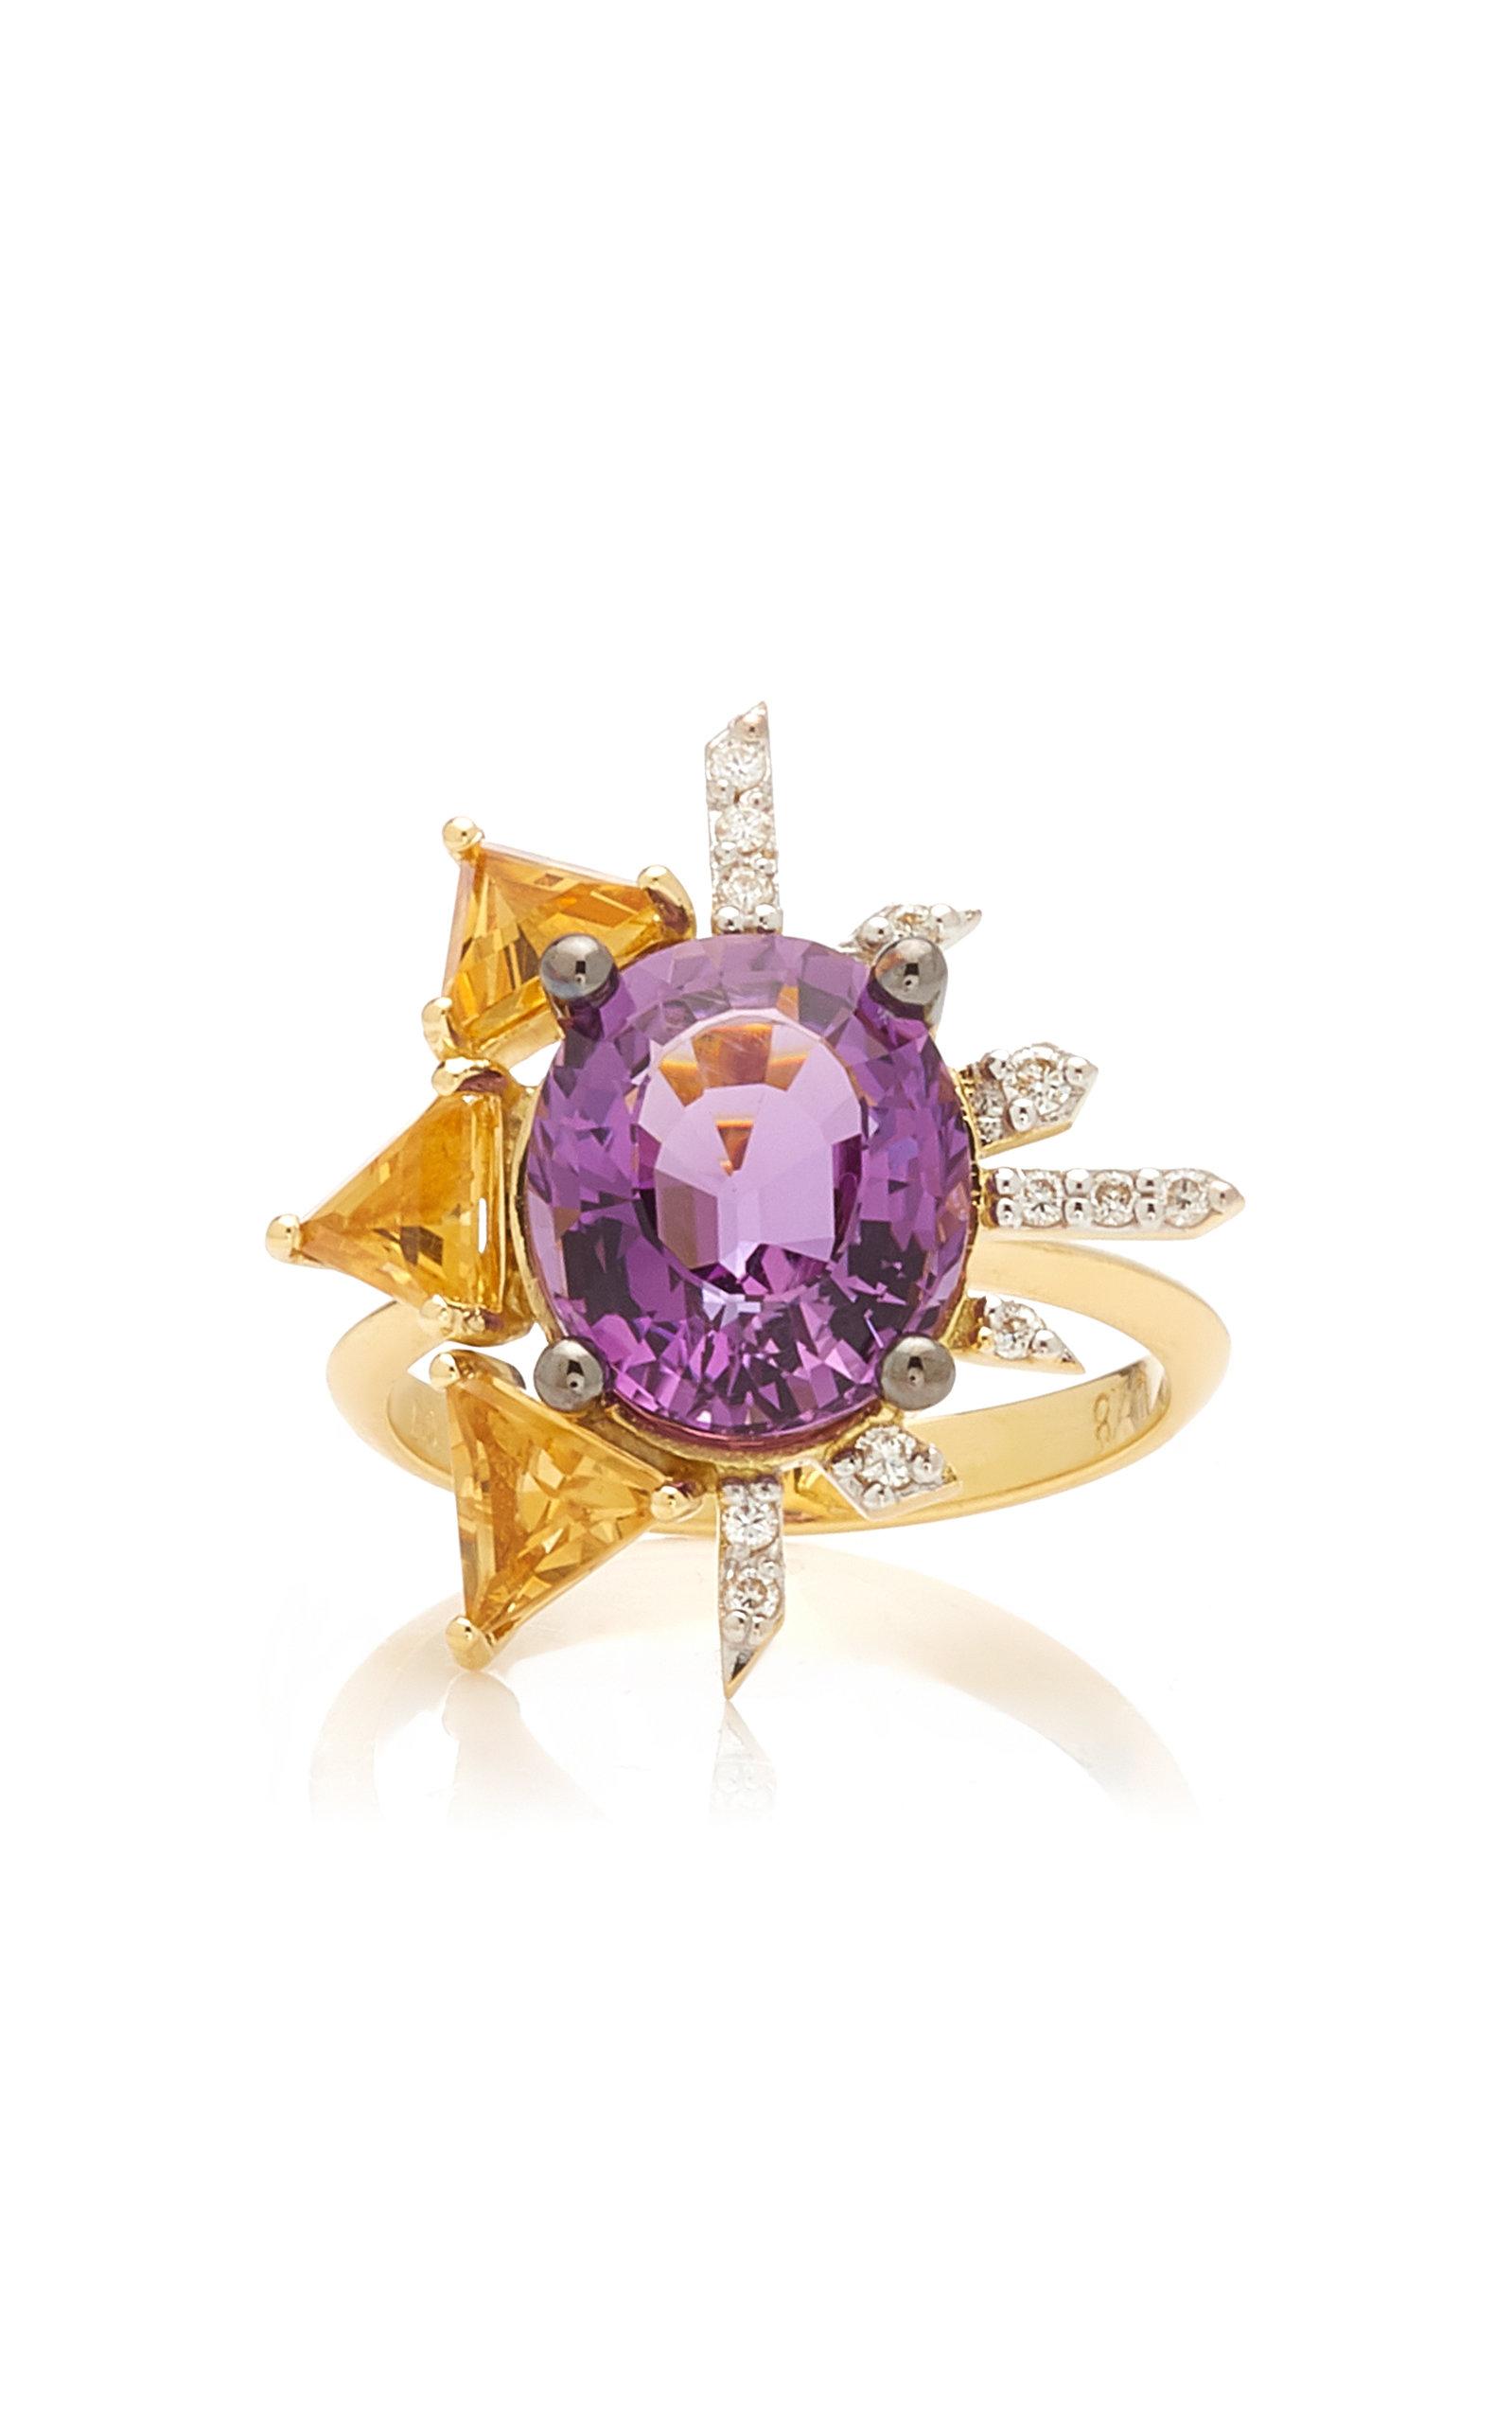 Women's Royal 18K Yellow Gold Amethyst; Diamond; Citrine Ring